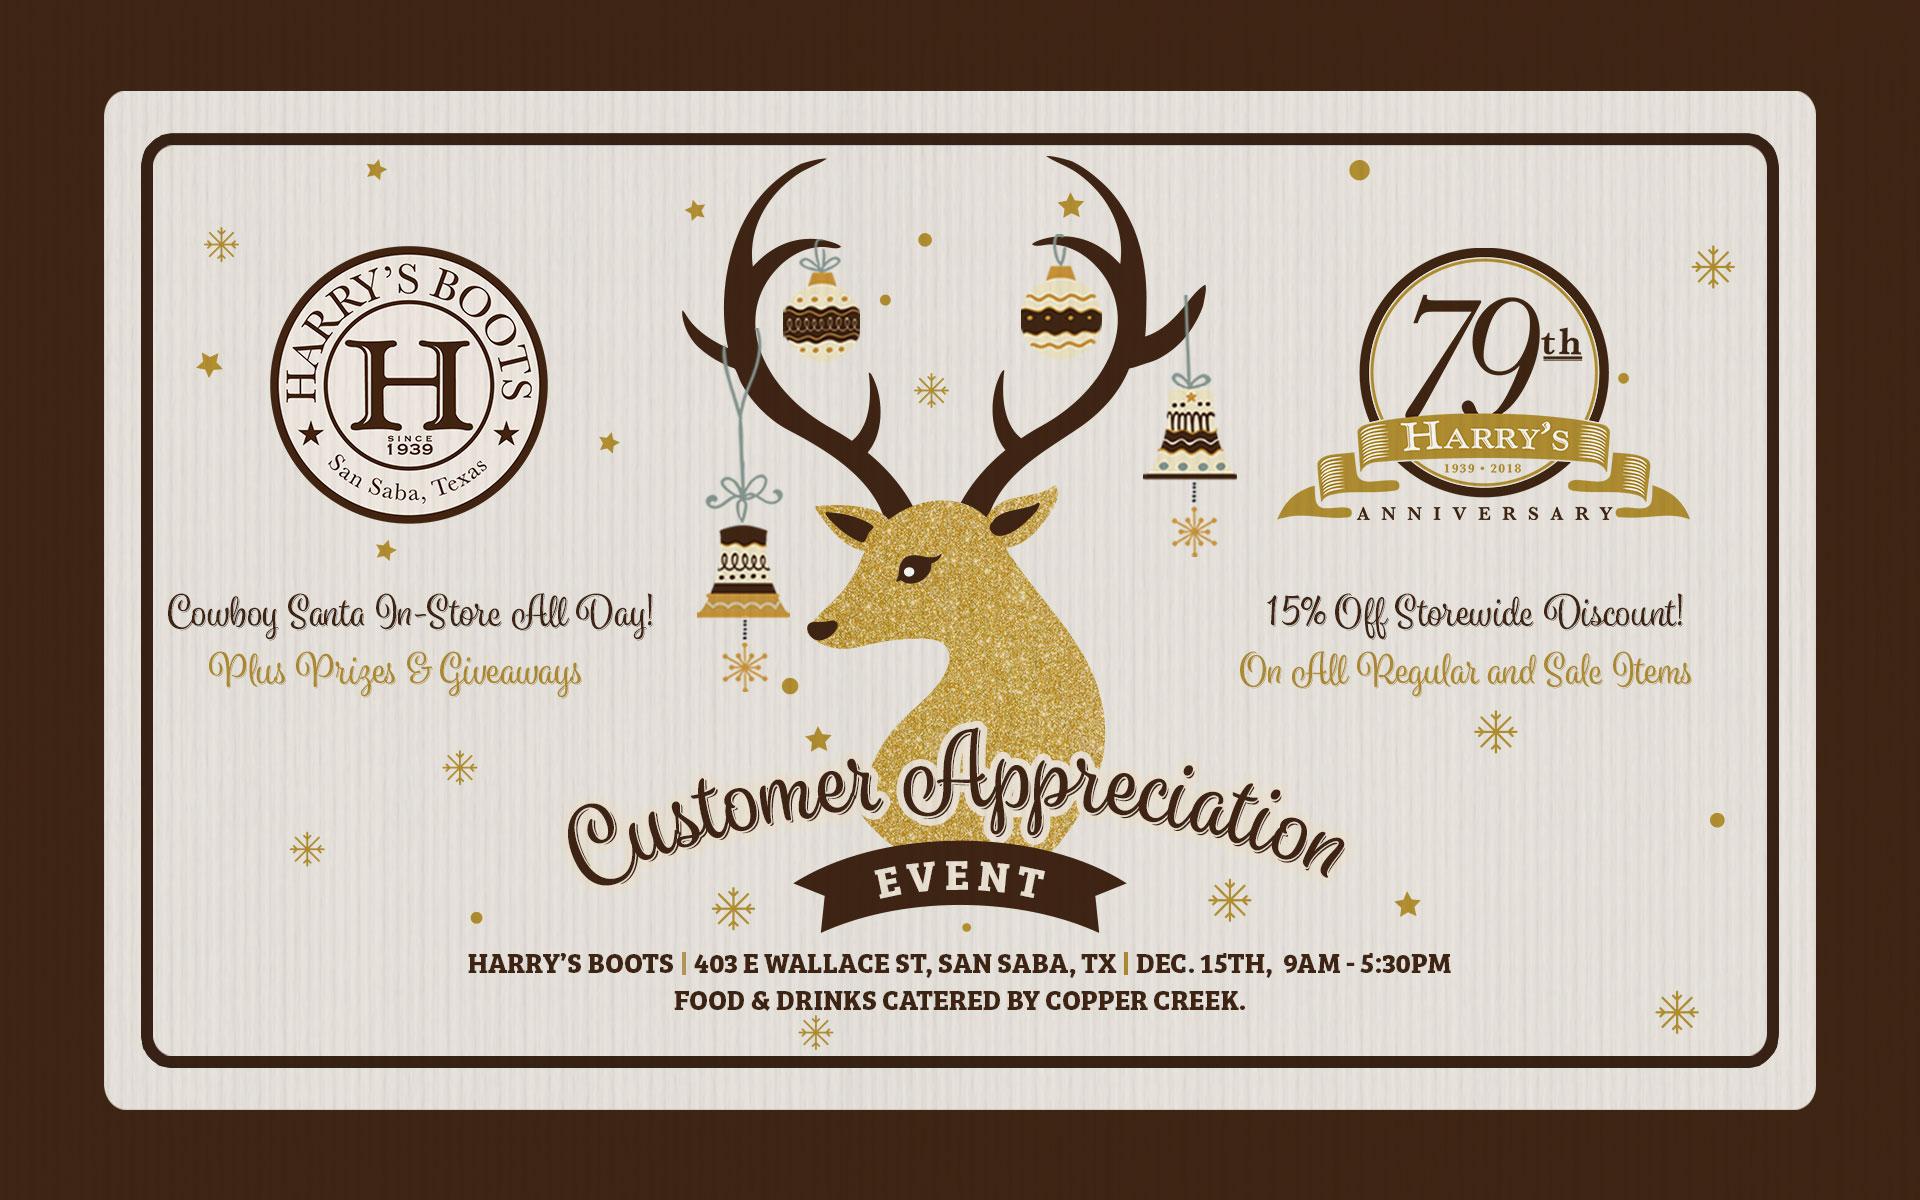 Harry's Boots 79th Anniversary & Customer Appreciation Event